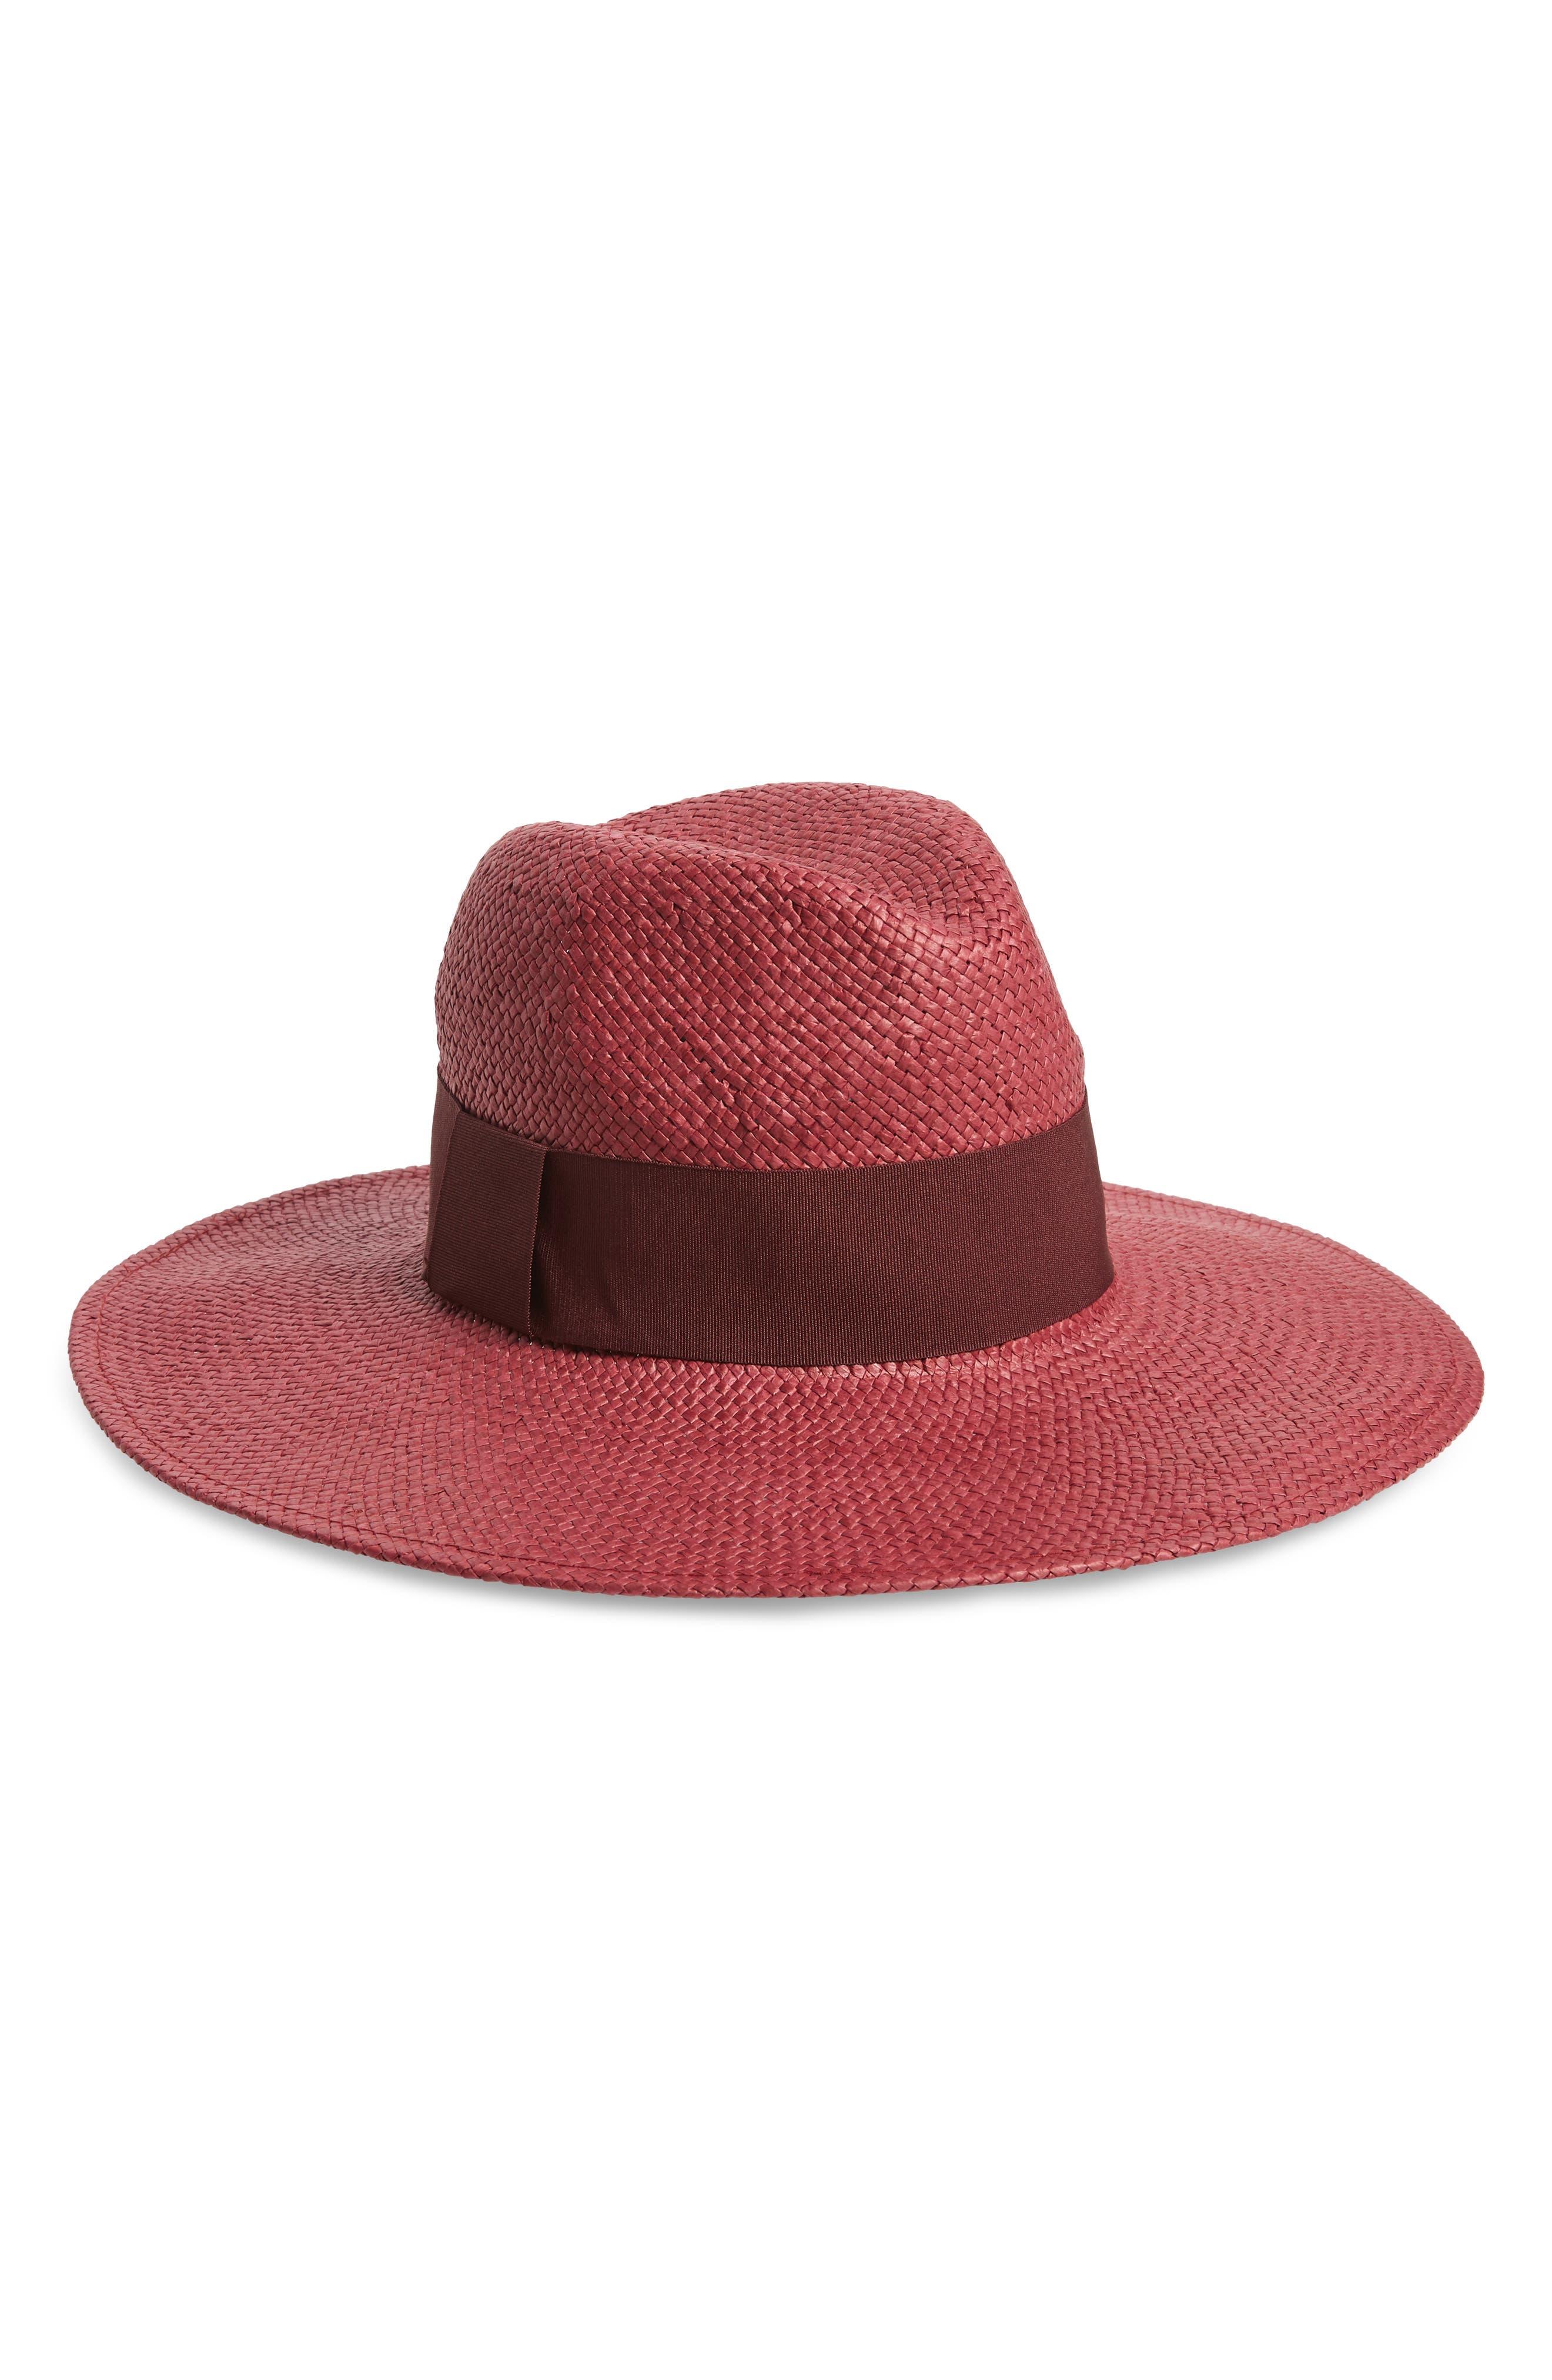 c3746fb41ddec Halogen® Hats for Women